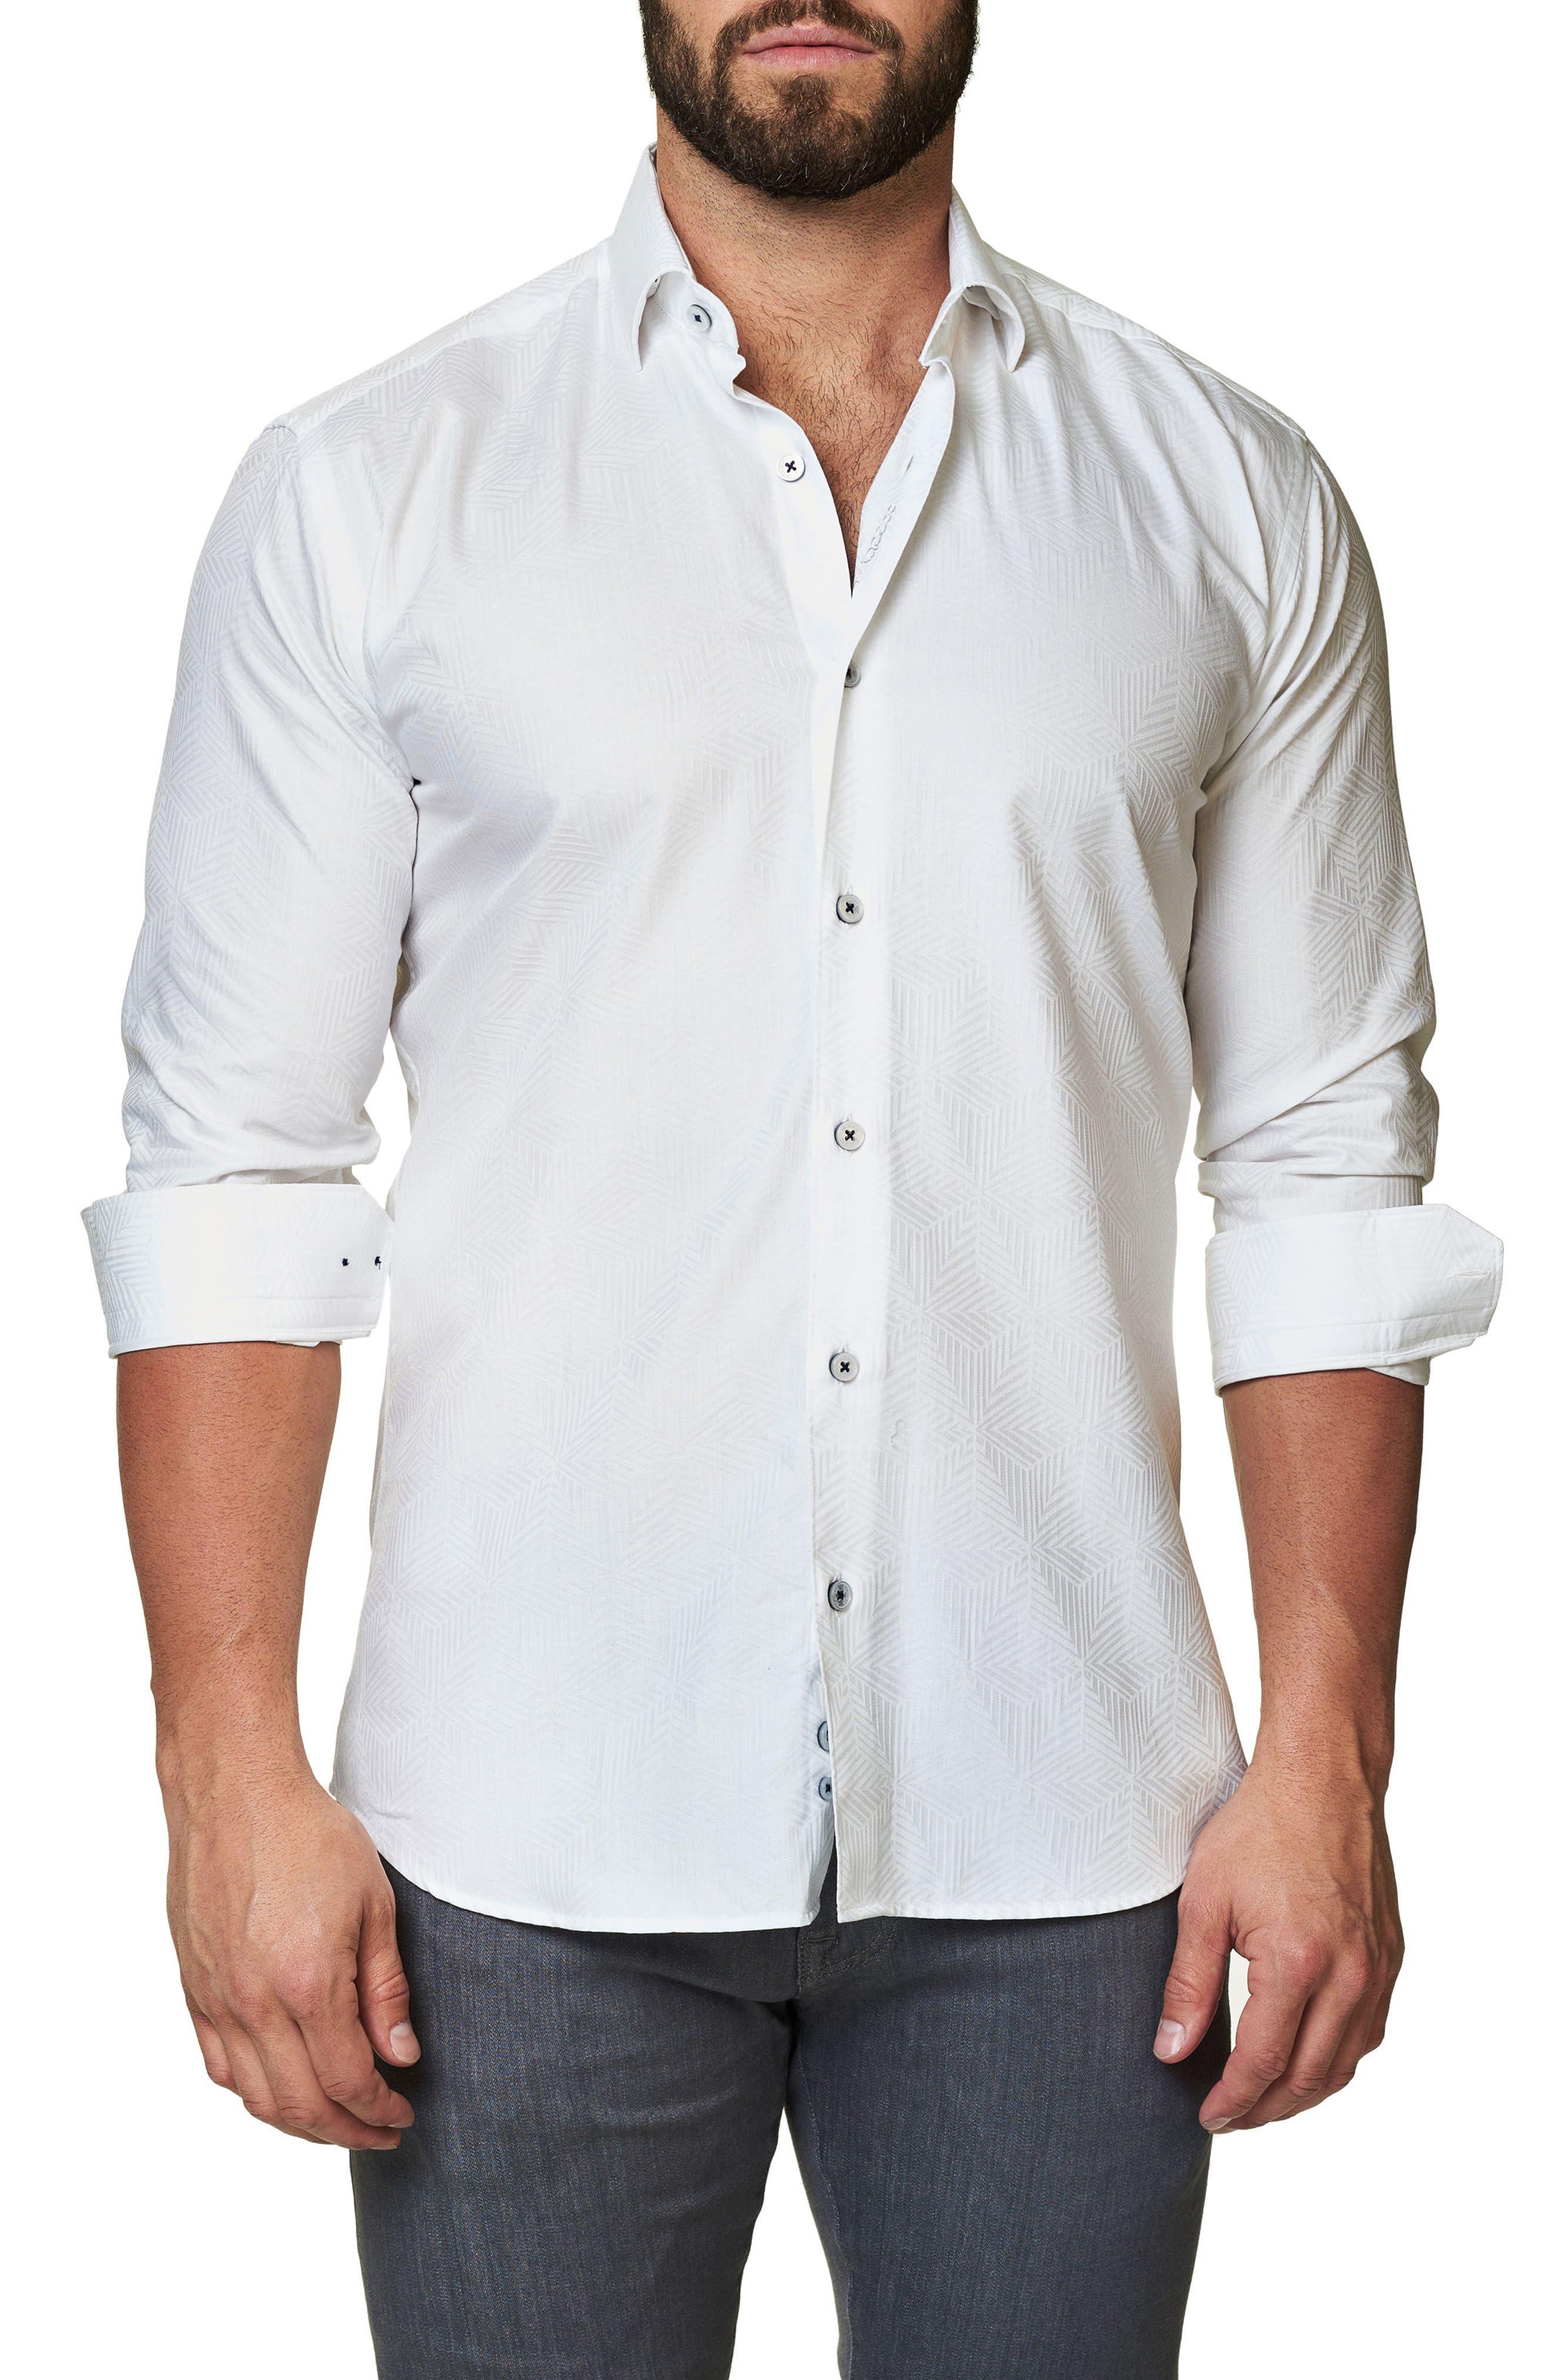 Main Image - Maceoo Trim Fit Geo Jacquard Sport Shirt